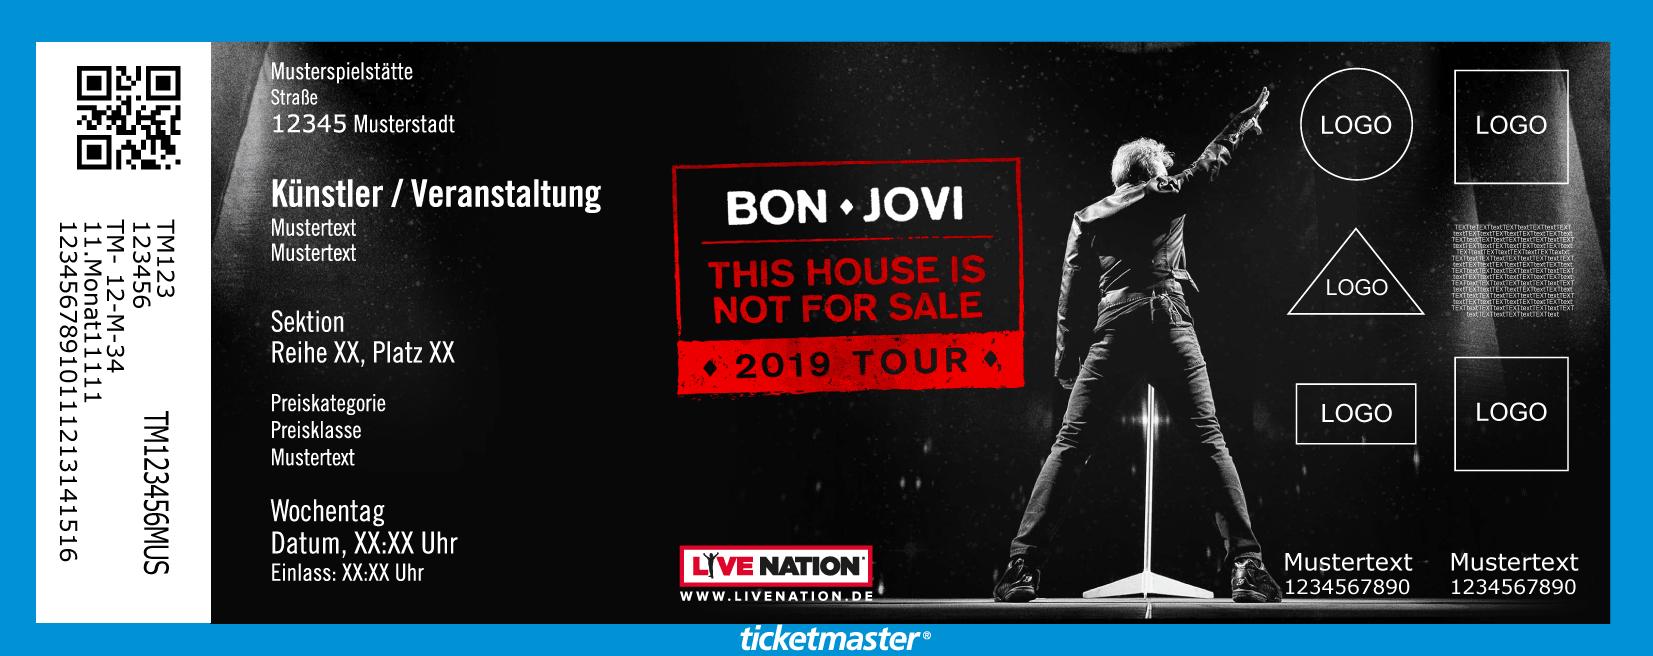 Bon Jovi Tickets München 05072019